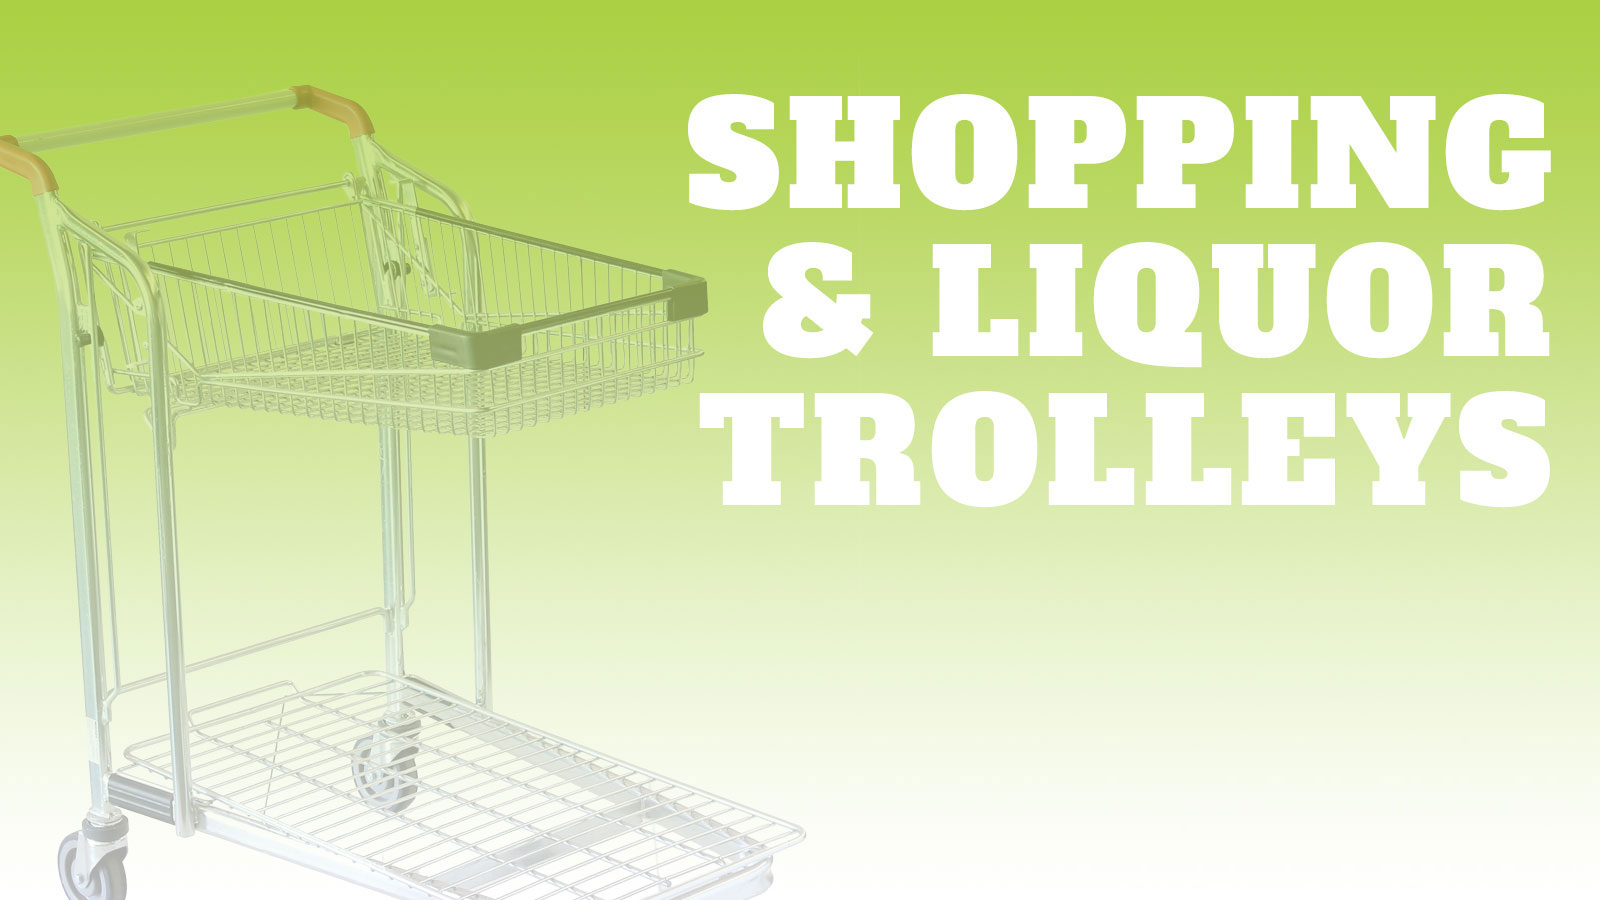 Warehouse-Shopping-&-Liquor